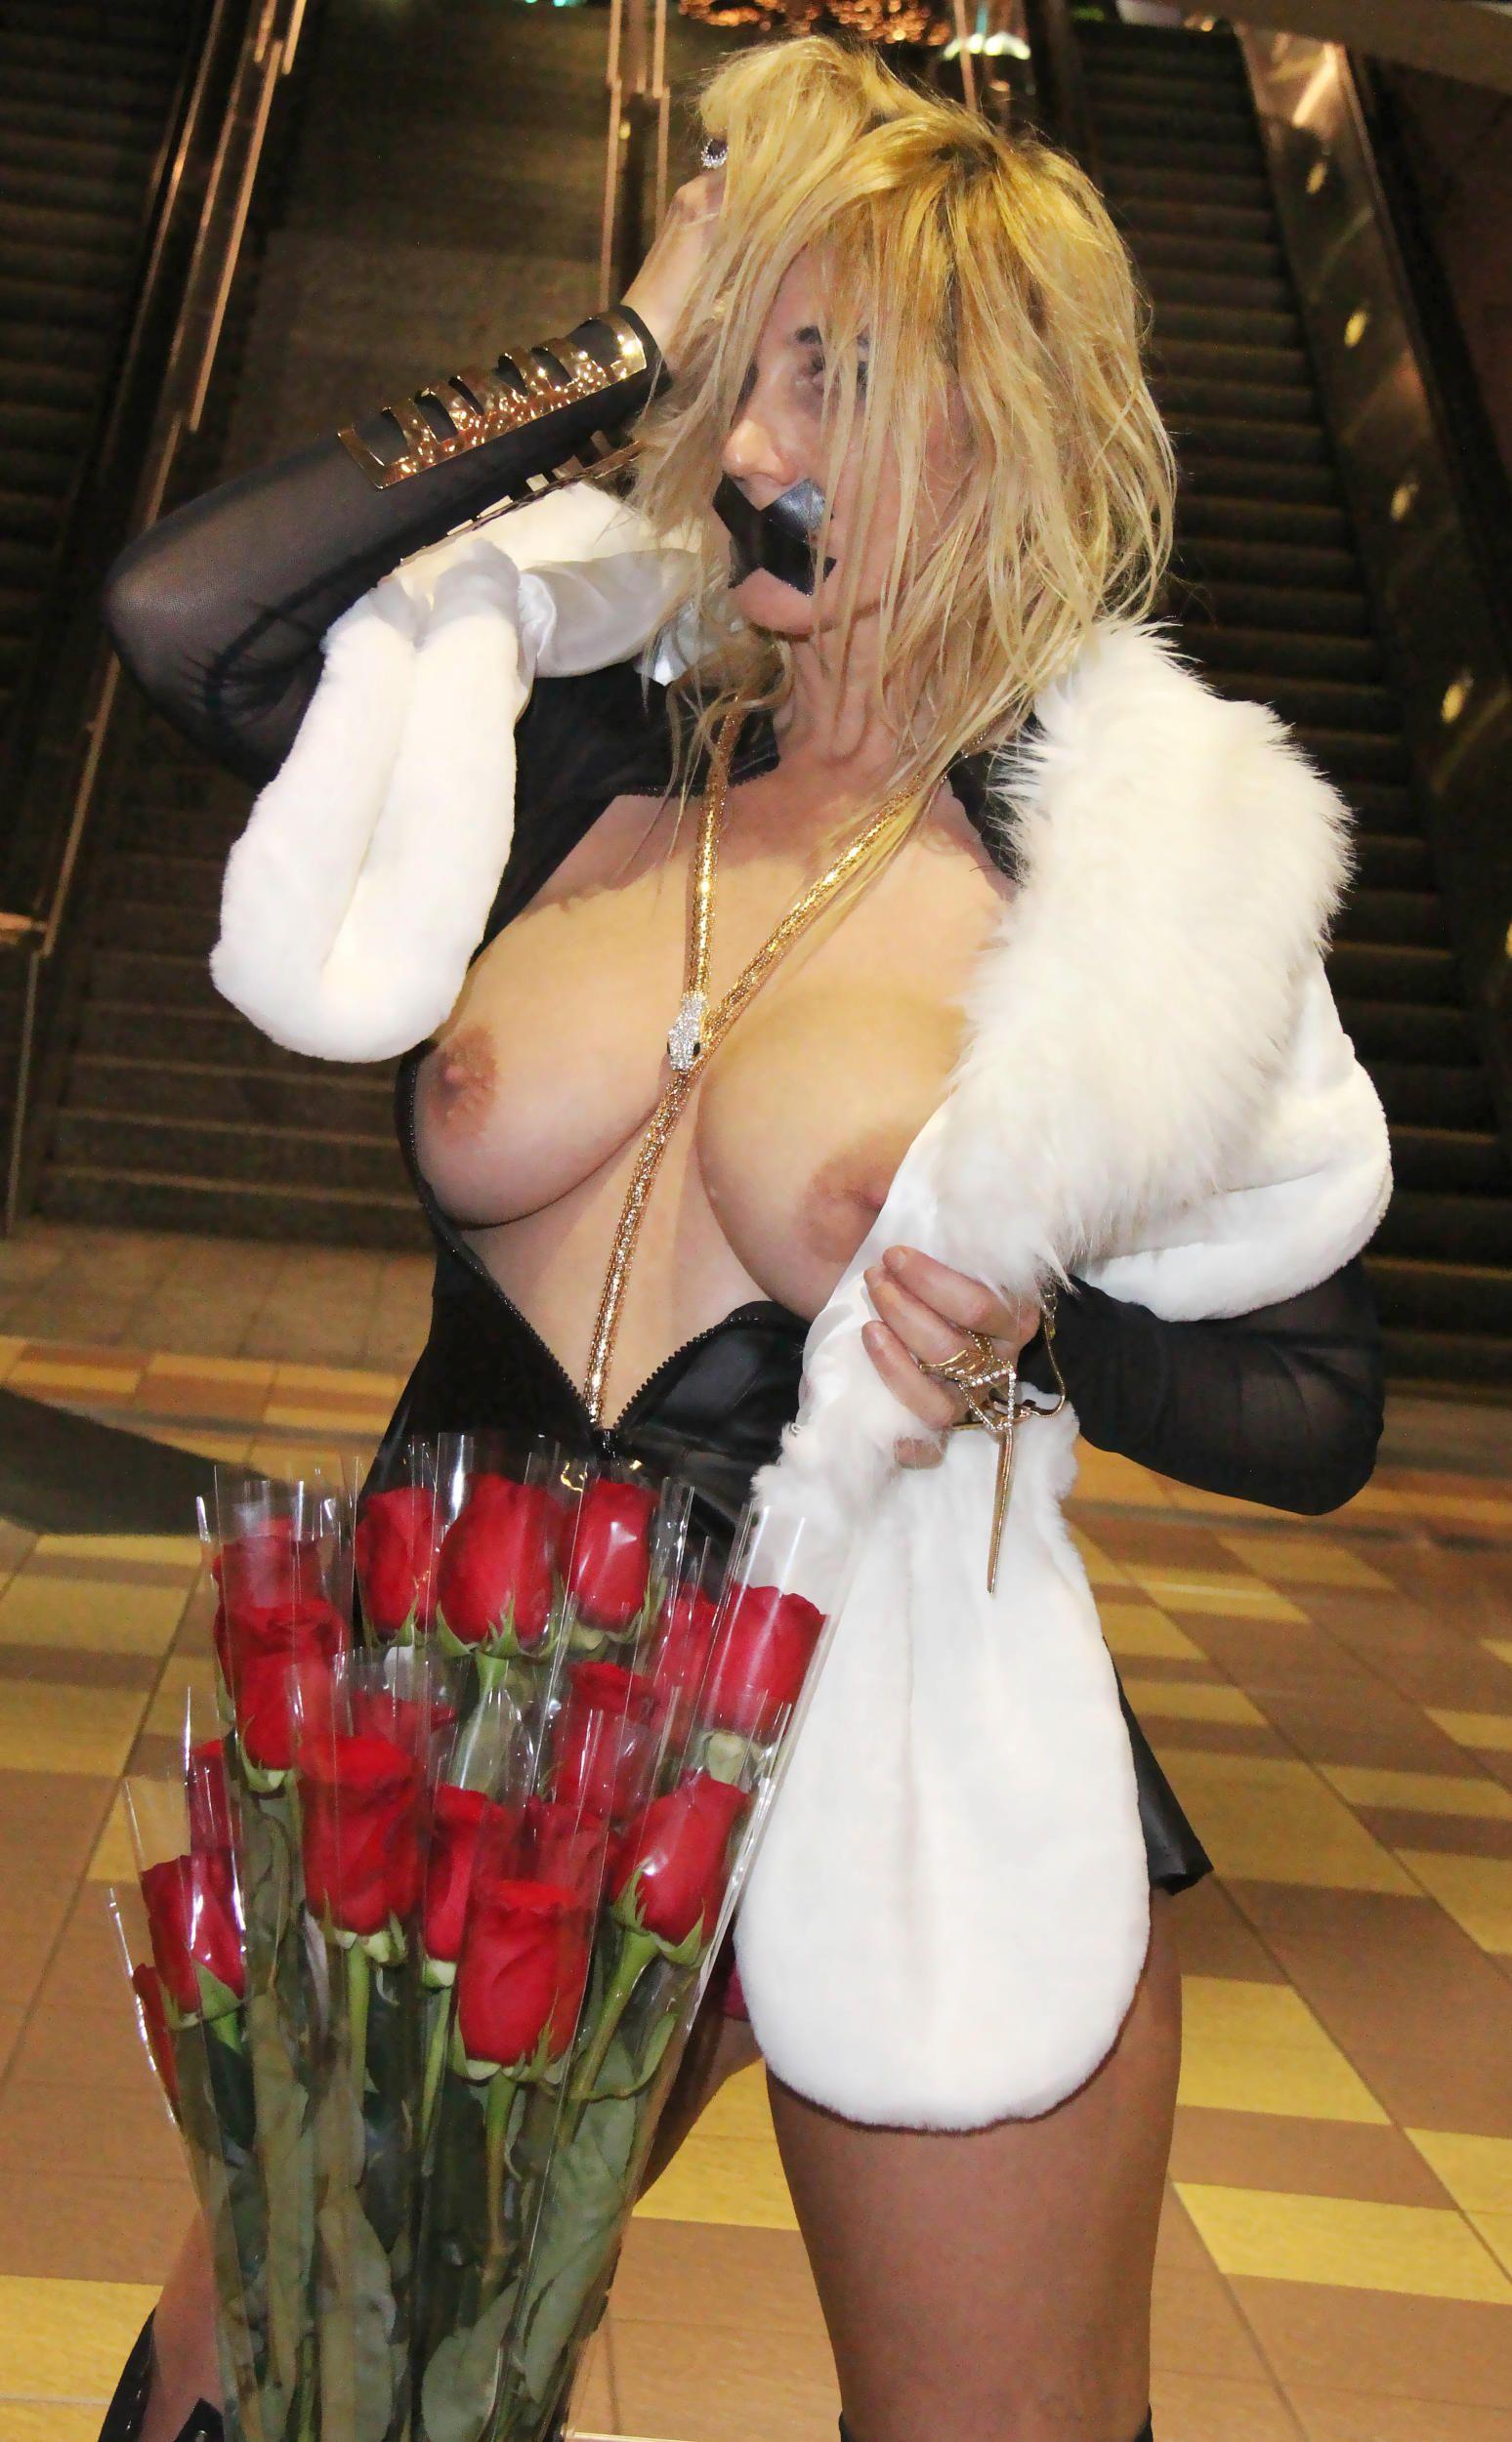 Nadeea-Volianova-Topless-5